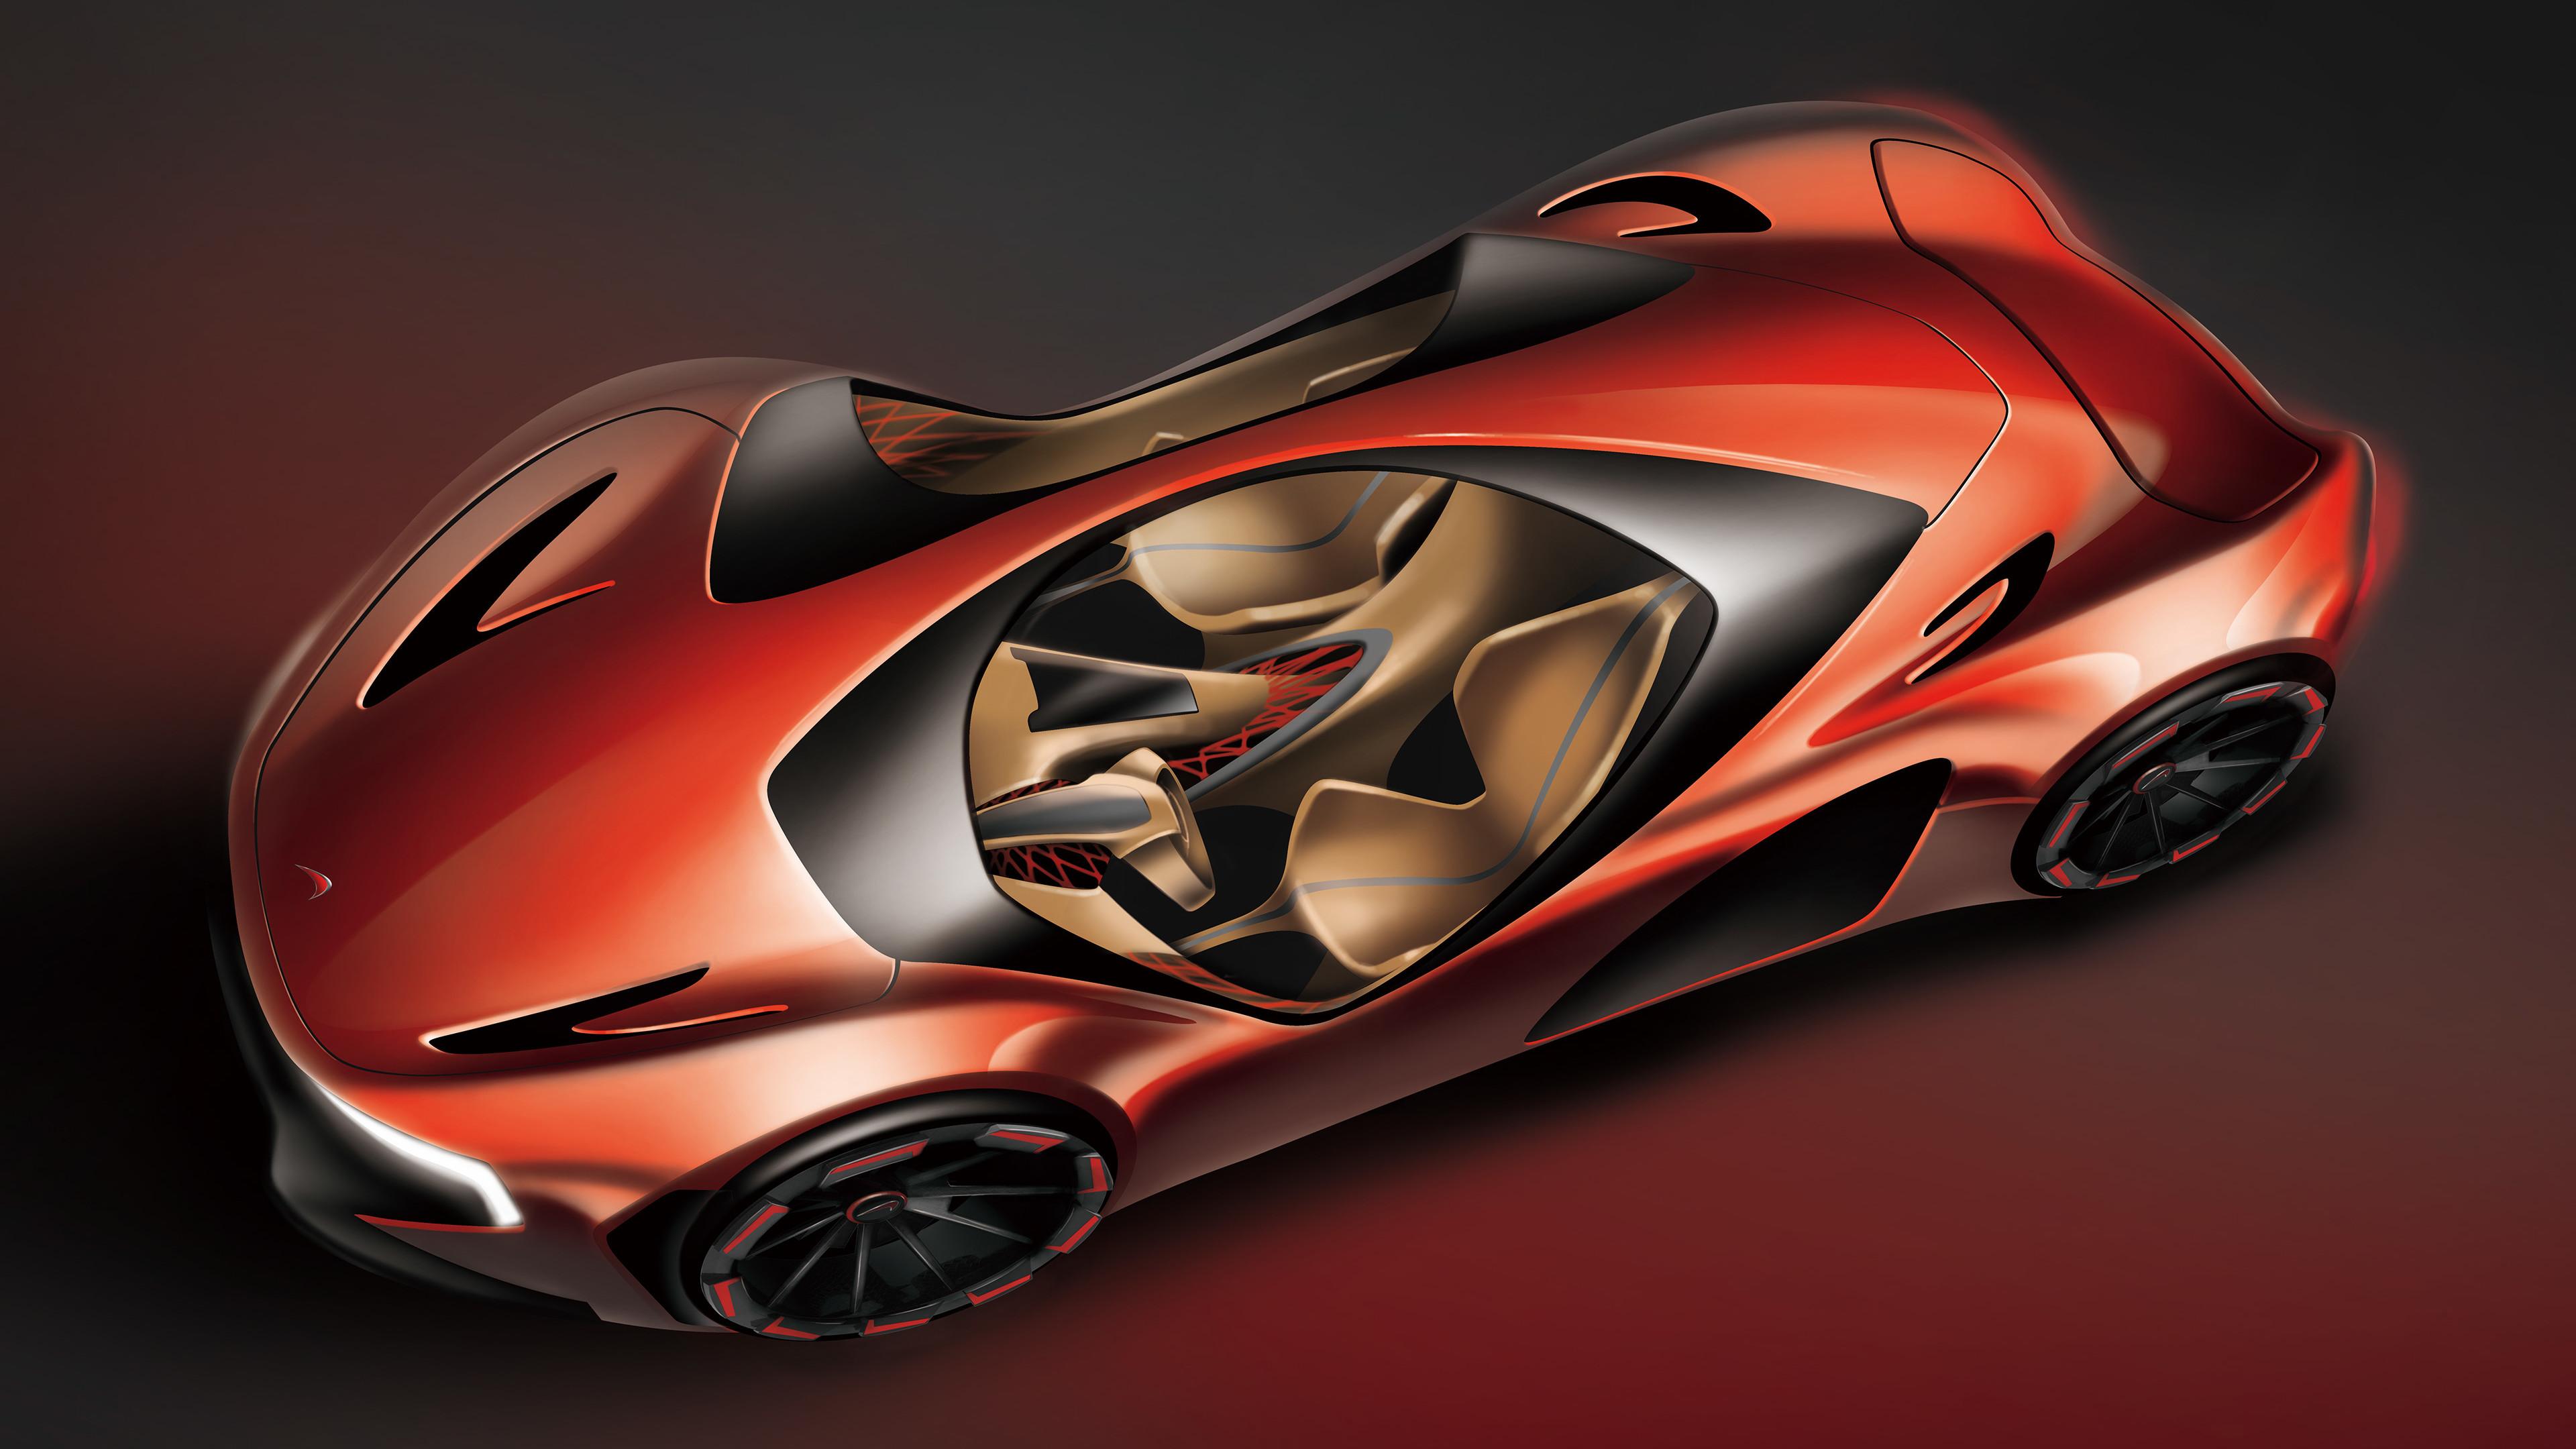 deadpool concept car 4k 1555206905 - Deadpool Concept Car 4k - hd-wallpapers, cars wallpapers, behance wallpapers, 4k-wallpapers